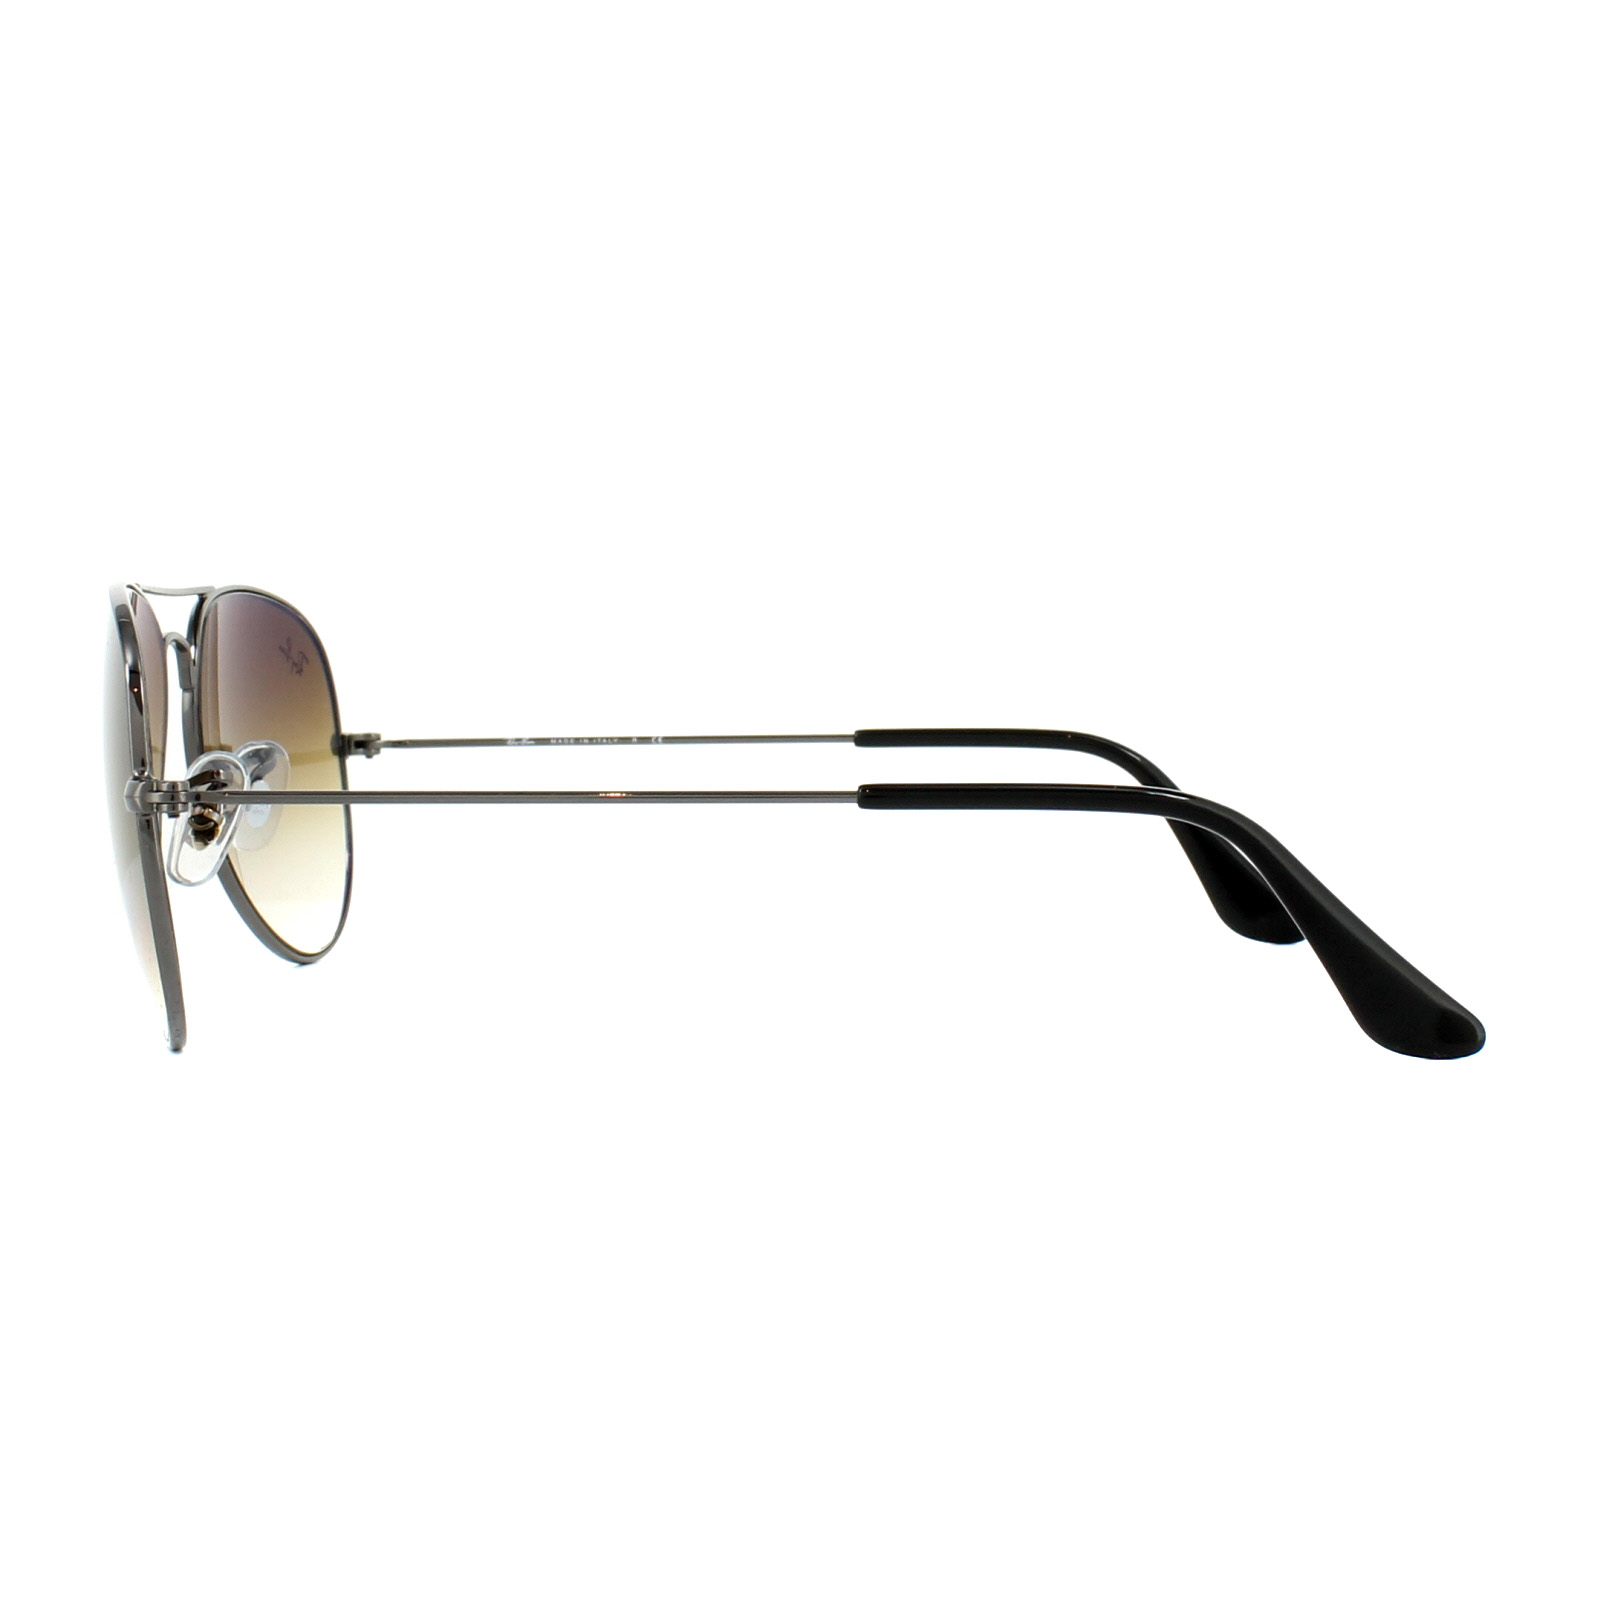 2150e1d40ebebc Sentinel Ray-Ban Sunglasses Aviator 3025 004 51 Gunmetal Brown Small 55mm